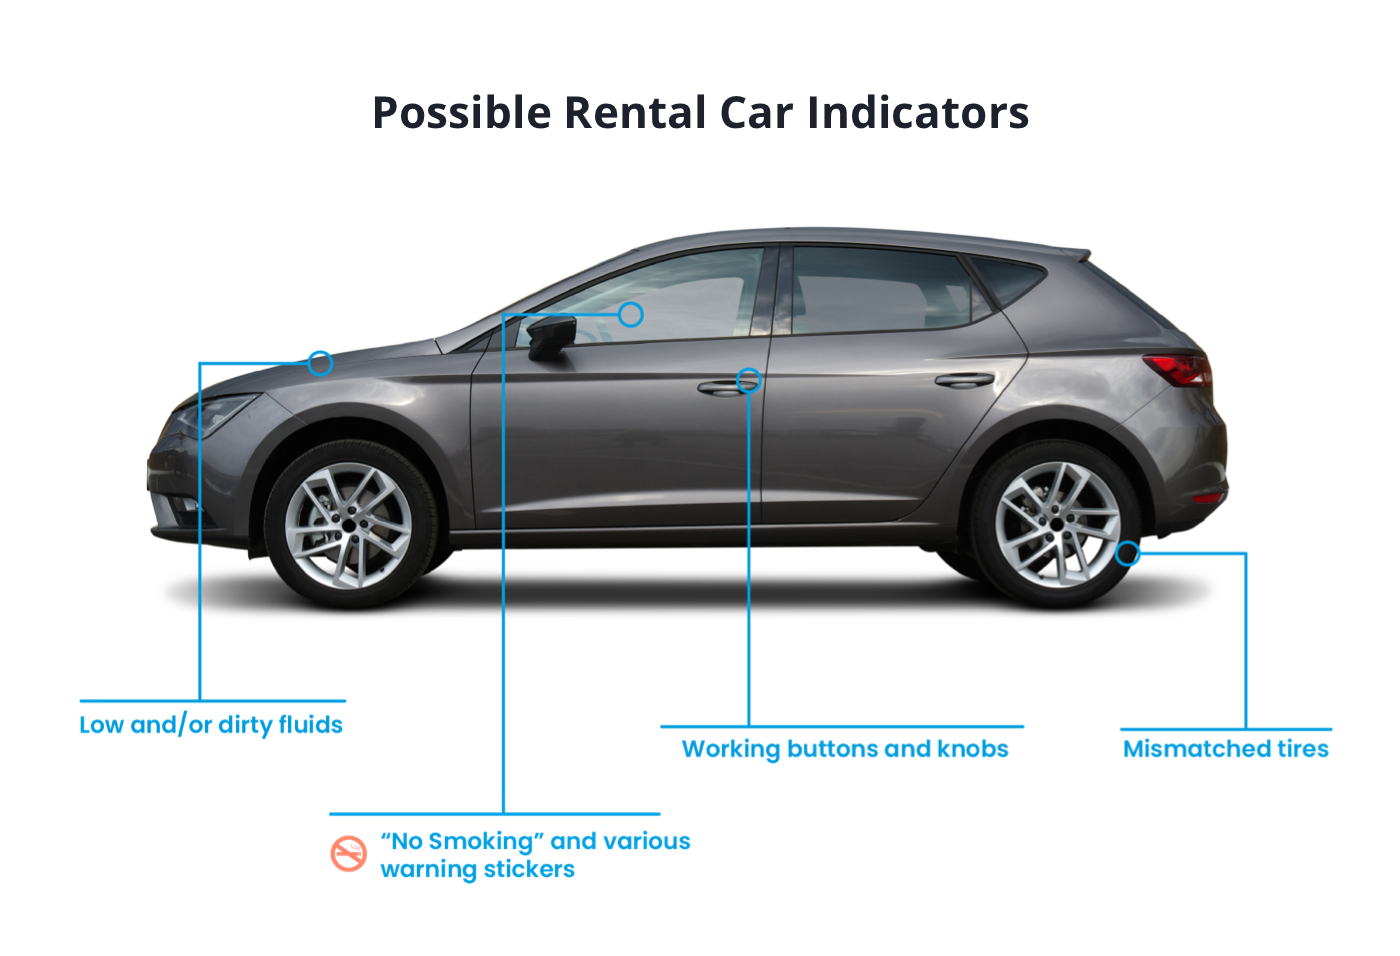 Used rental cars for sale: Possible rental car indicators